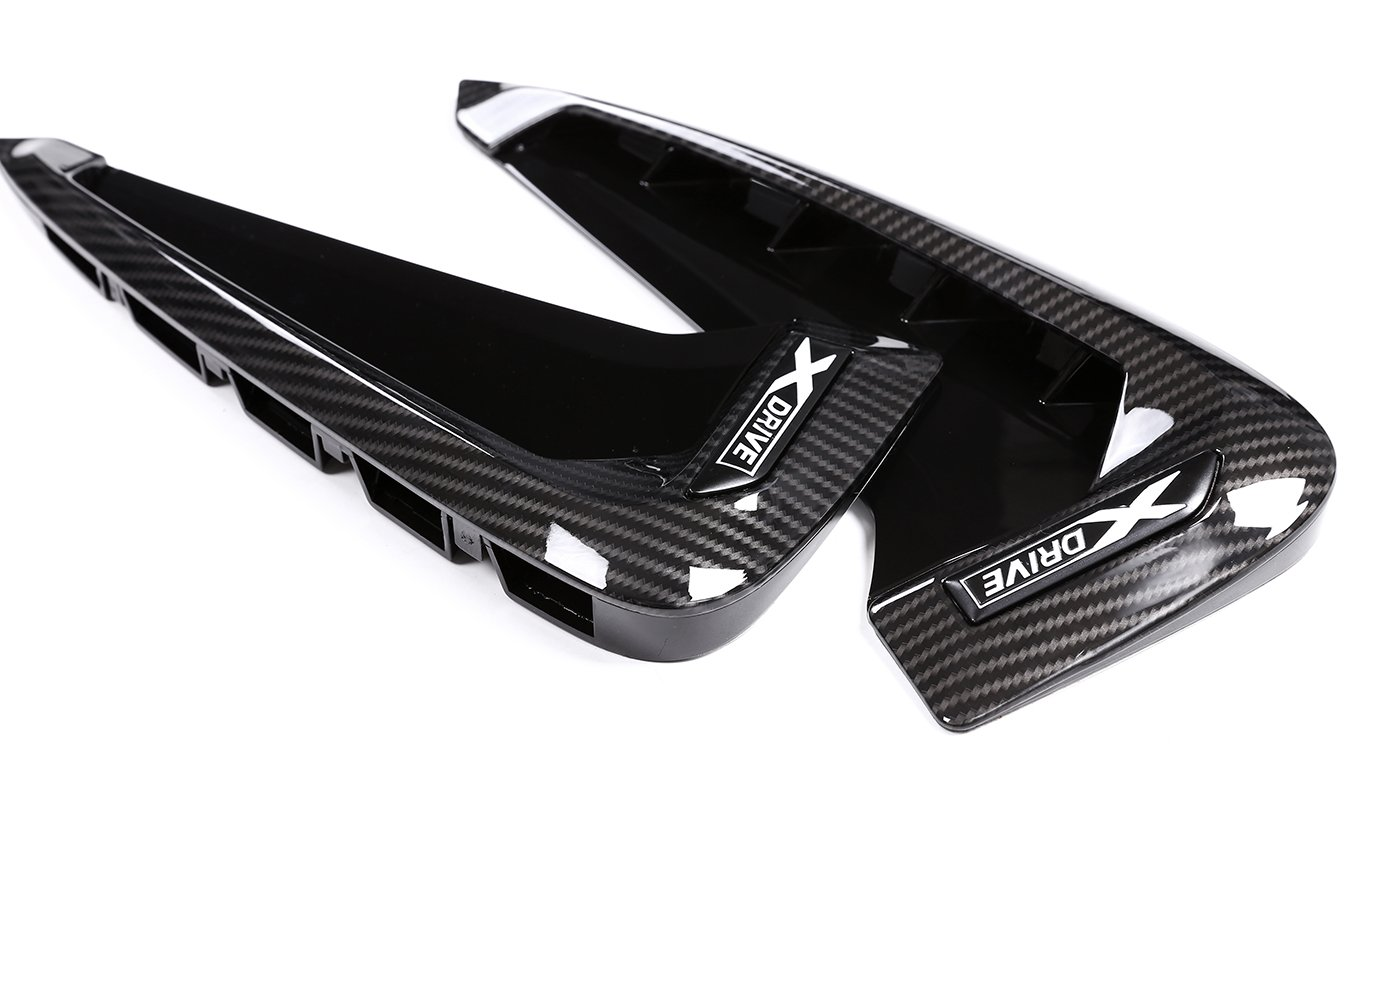 ABS Xdrive Carbon Fiber Shark Gills Side Decoration Fender Vent Trim for BMW X5 F15 X5M F85 14-17